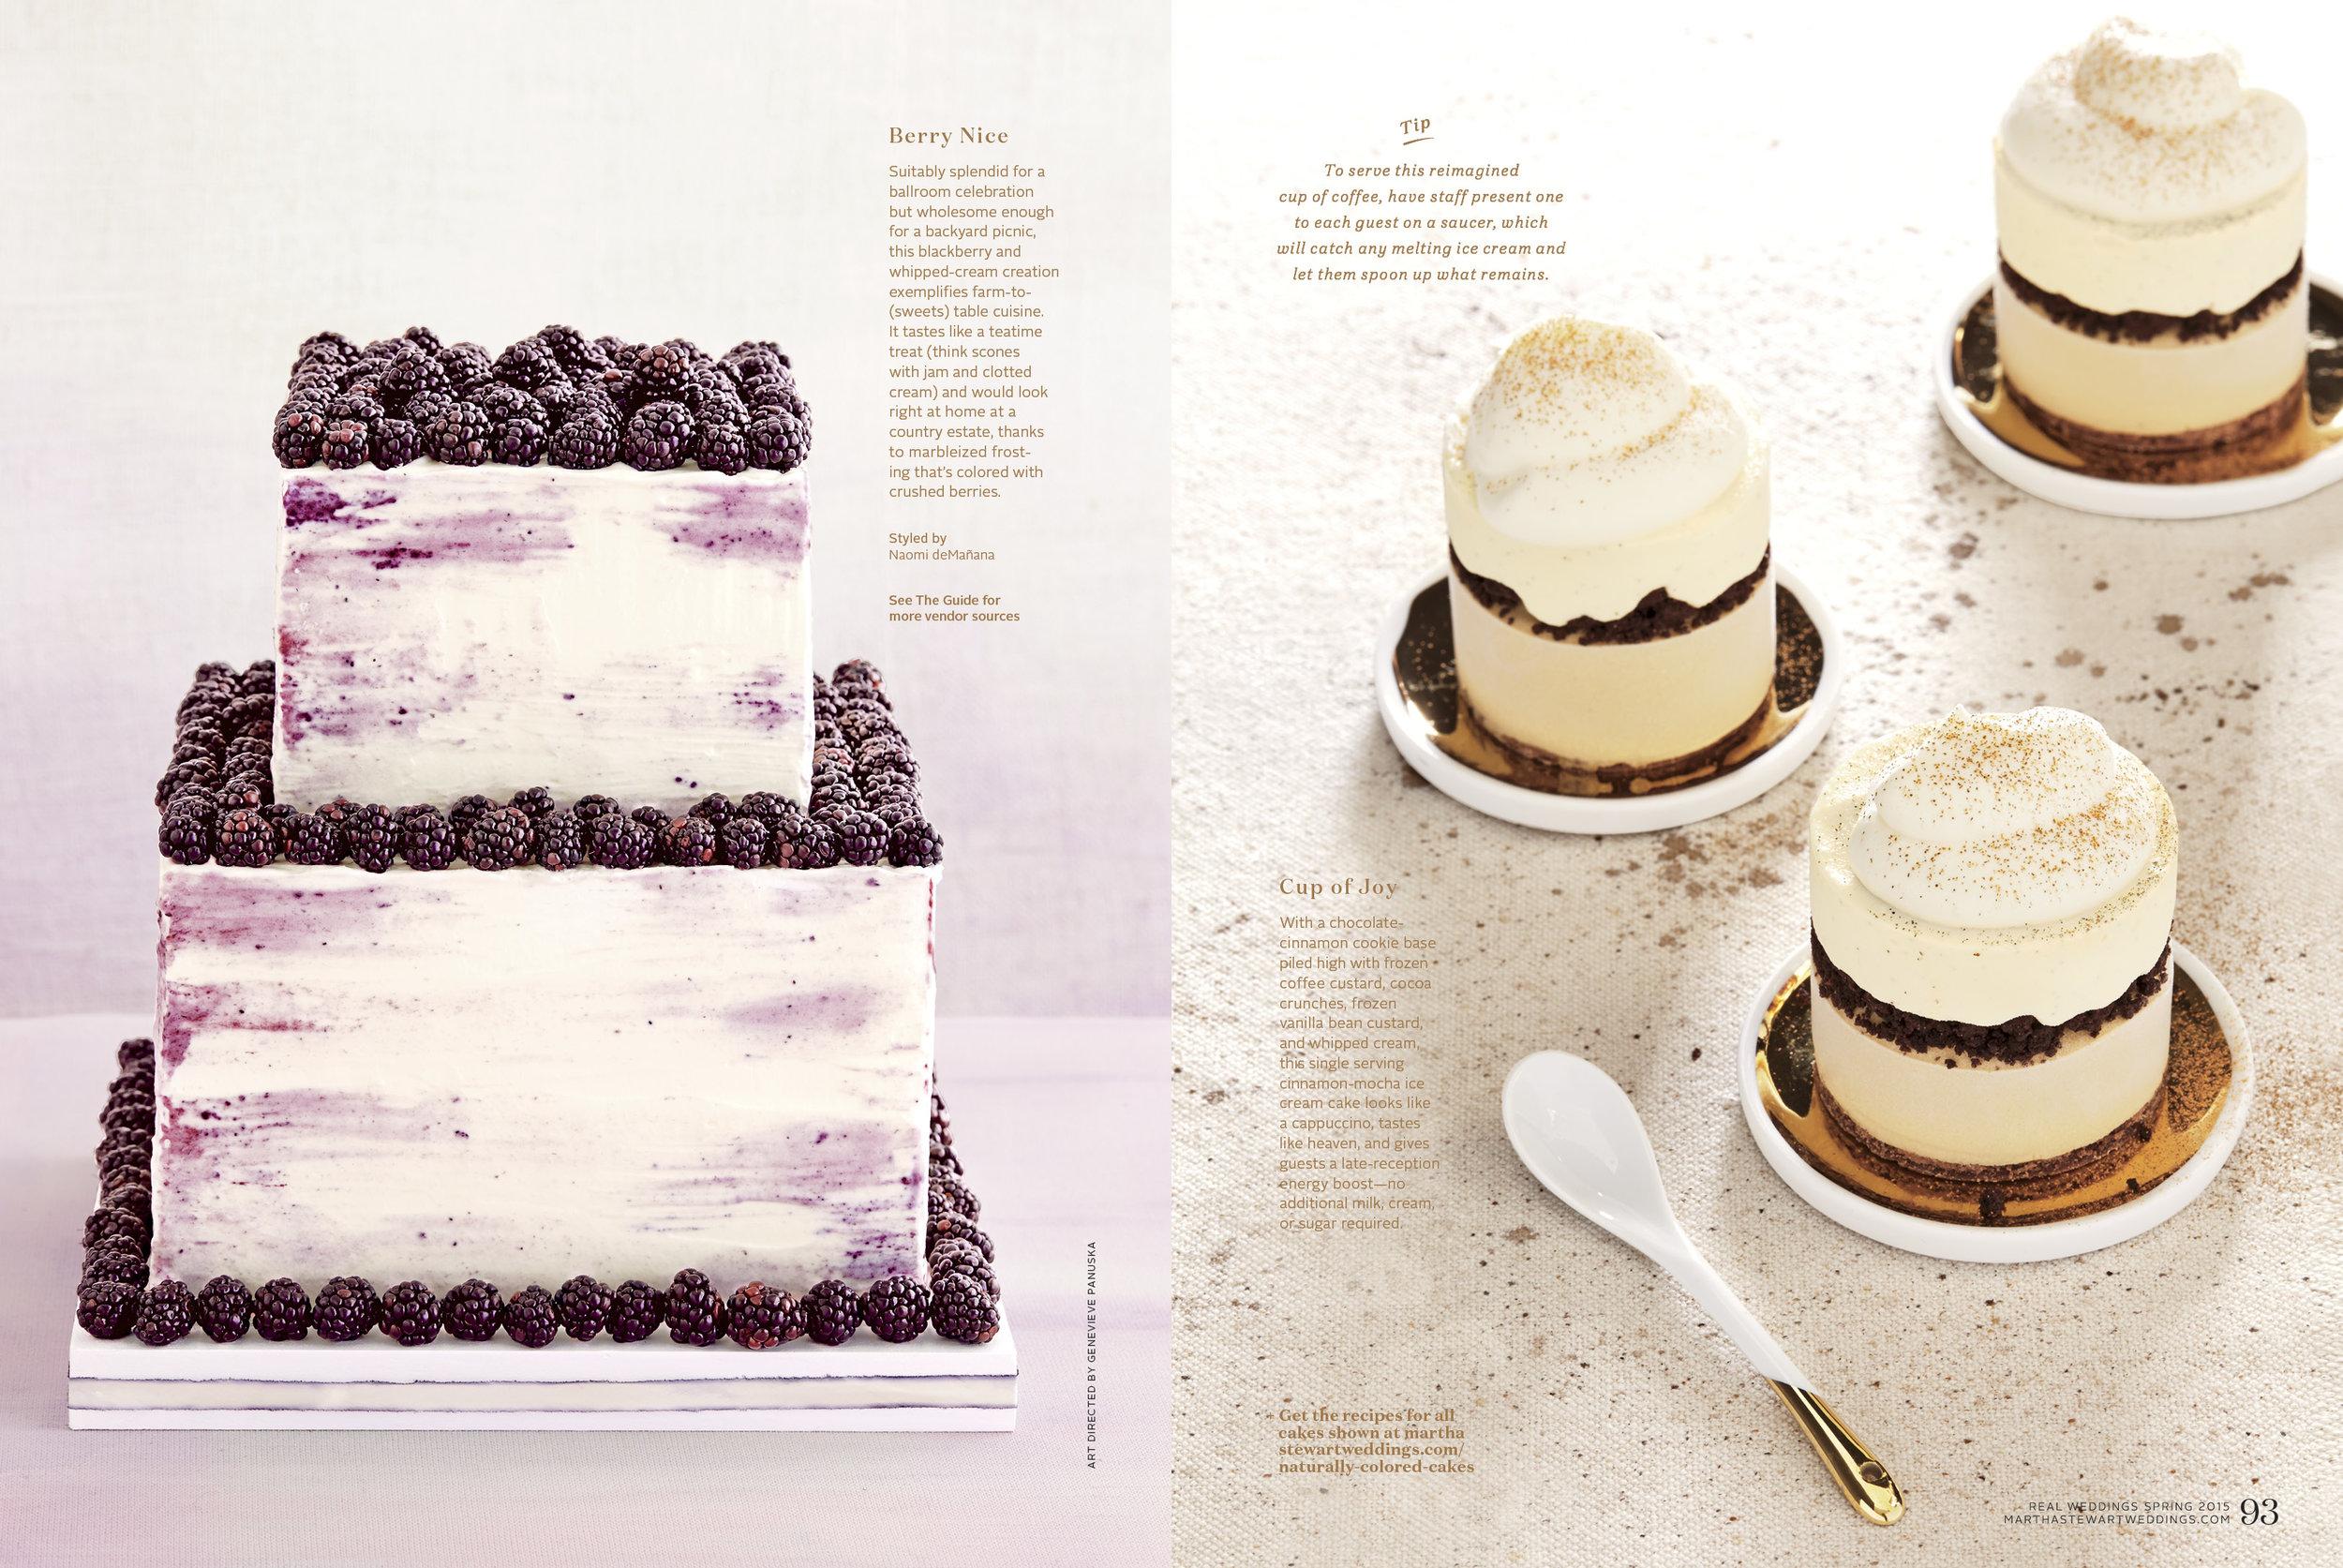 Blackberry and Cream Cake, Mocha Ice Cream Cakes, Martha Stewart Weddings